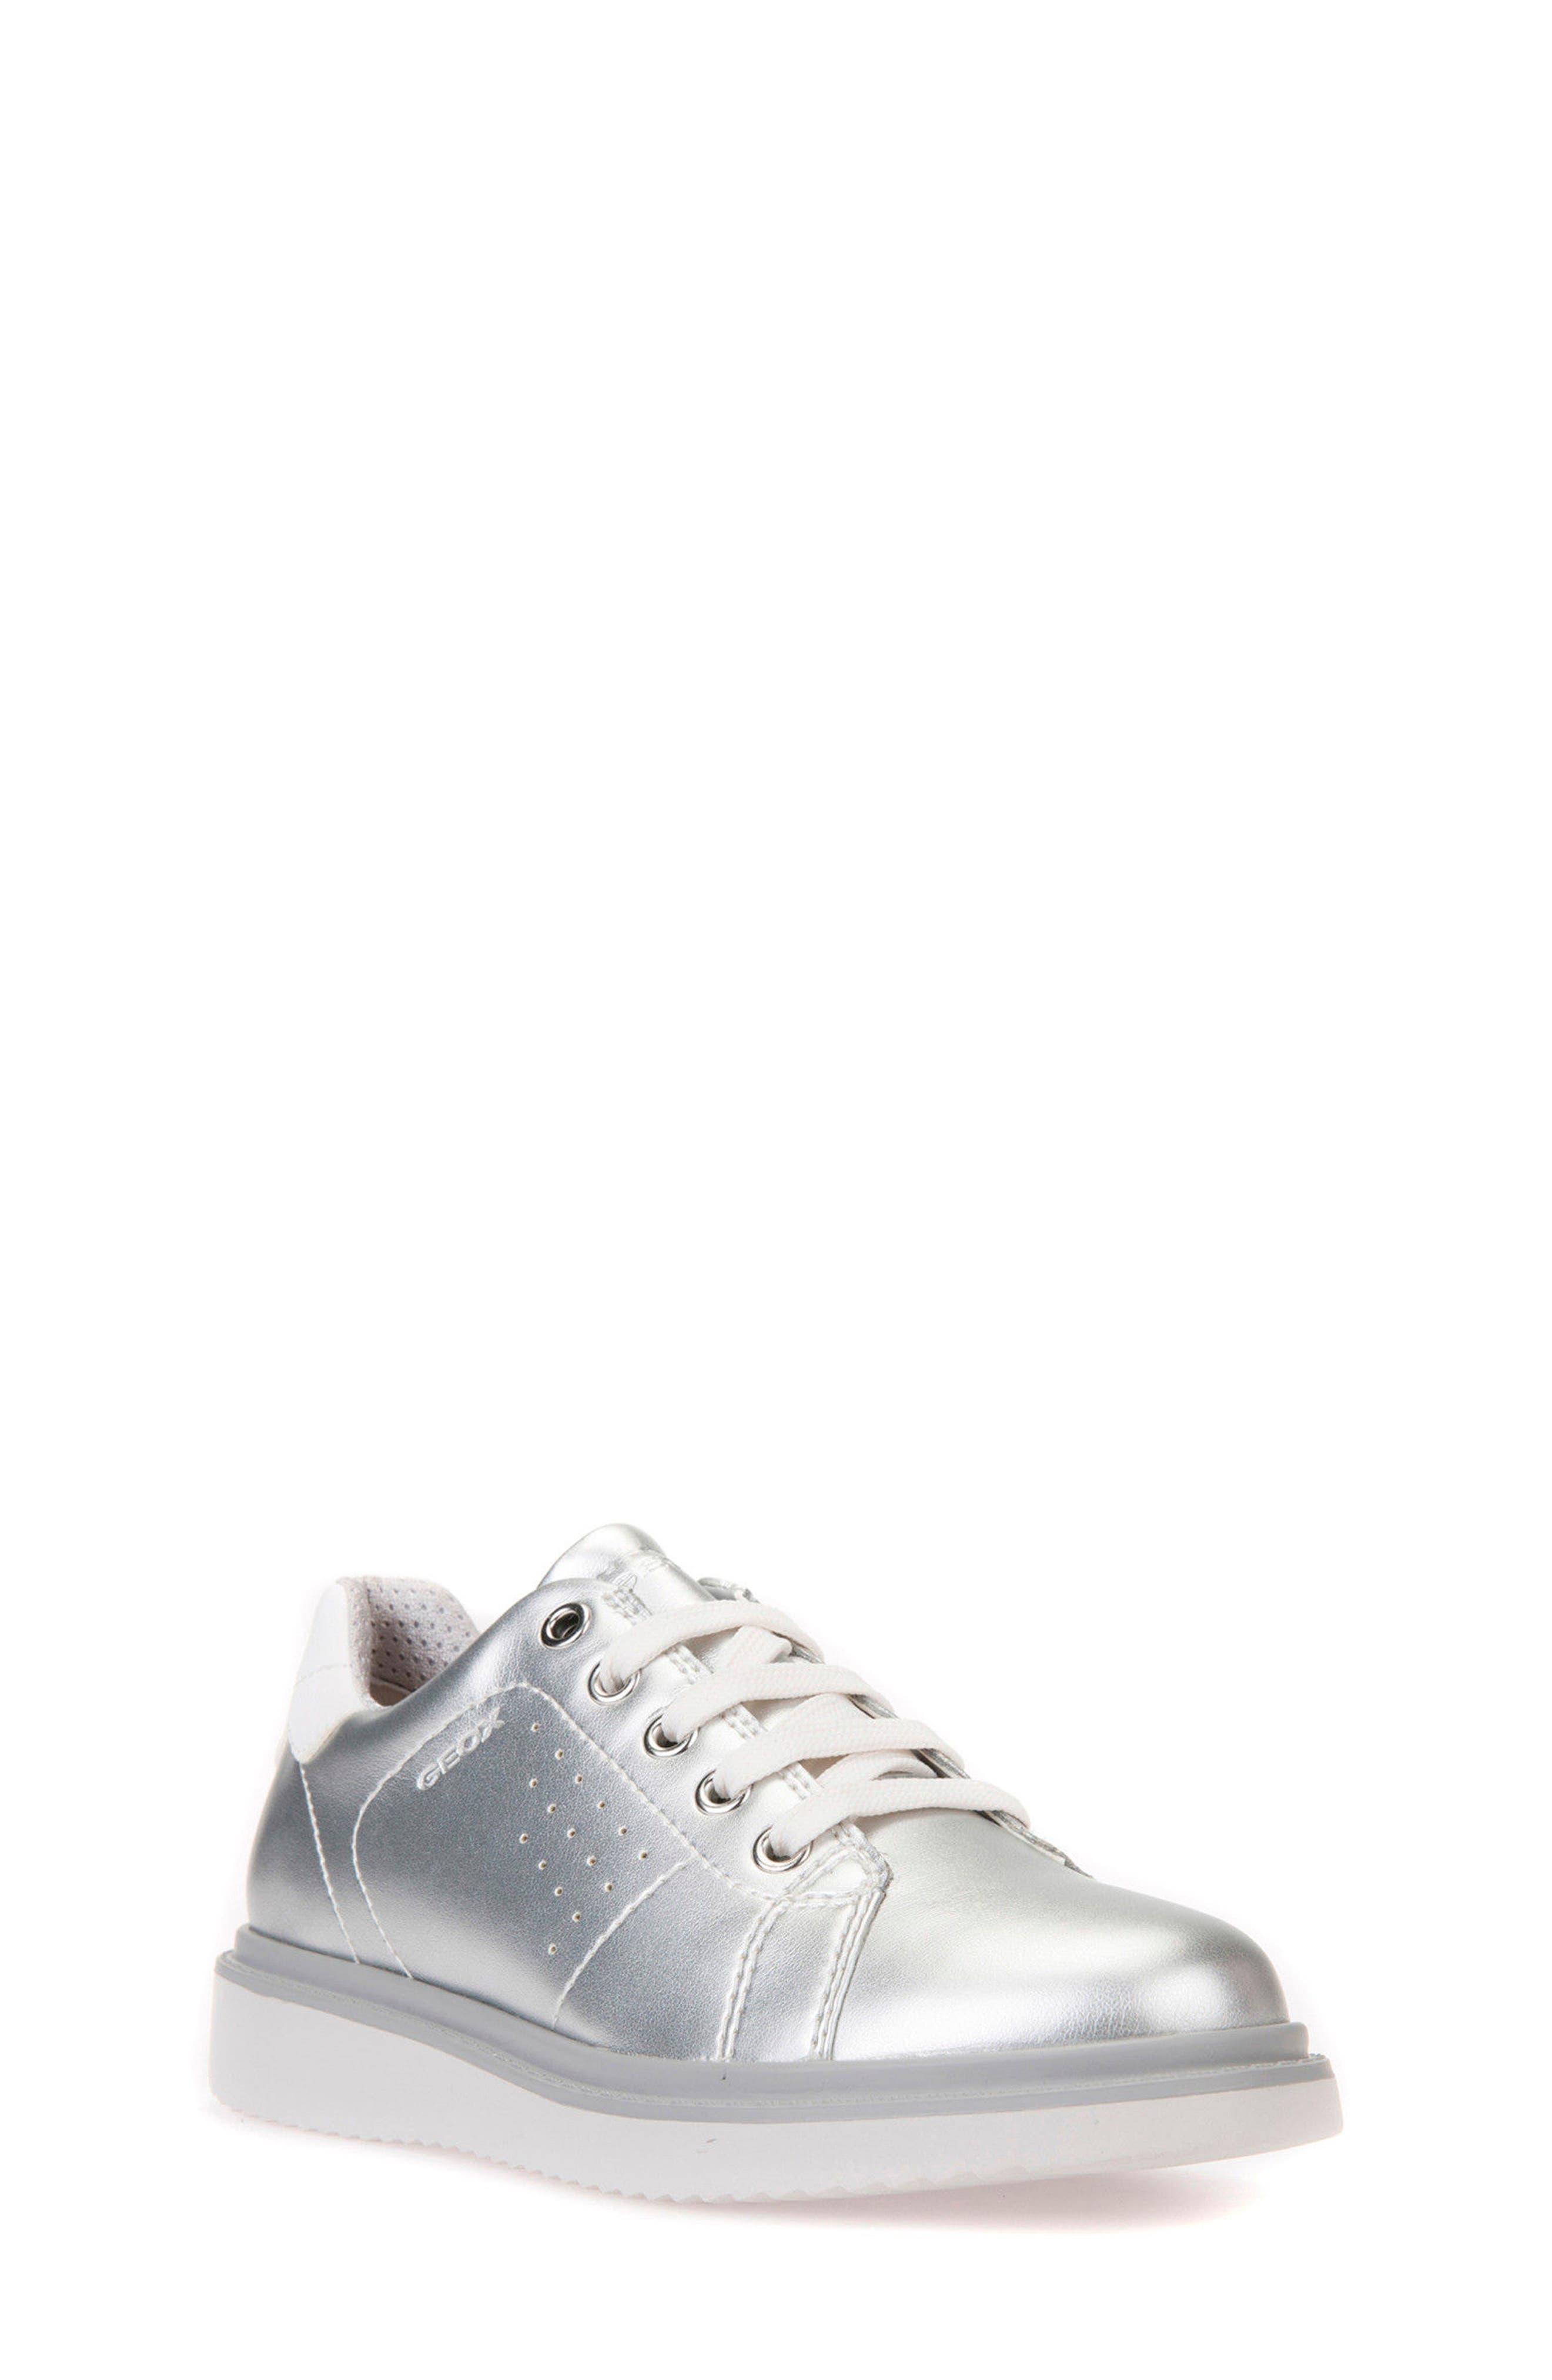 Thymar Low Top Sneaker,                             Main thumbnail 1, color,                             SILVER